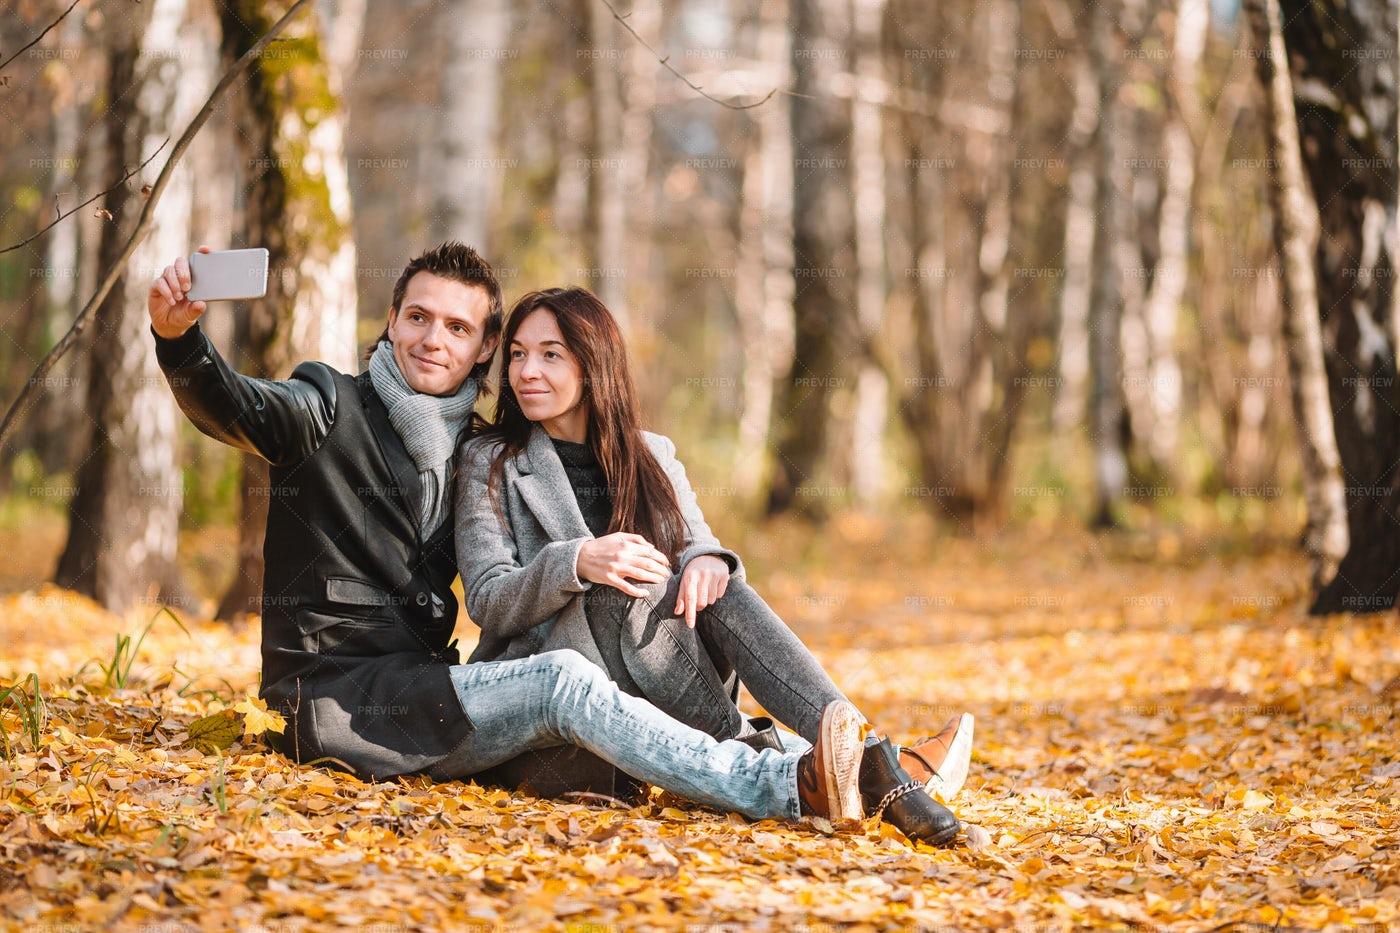 Couple Taking Selfie In Park: Stock Photos